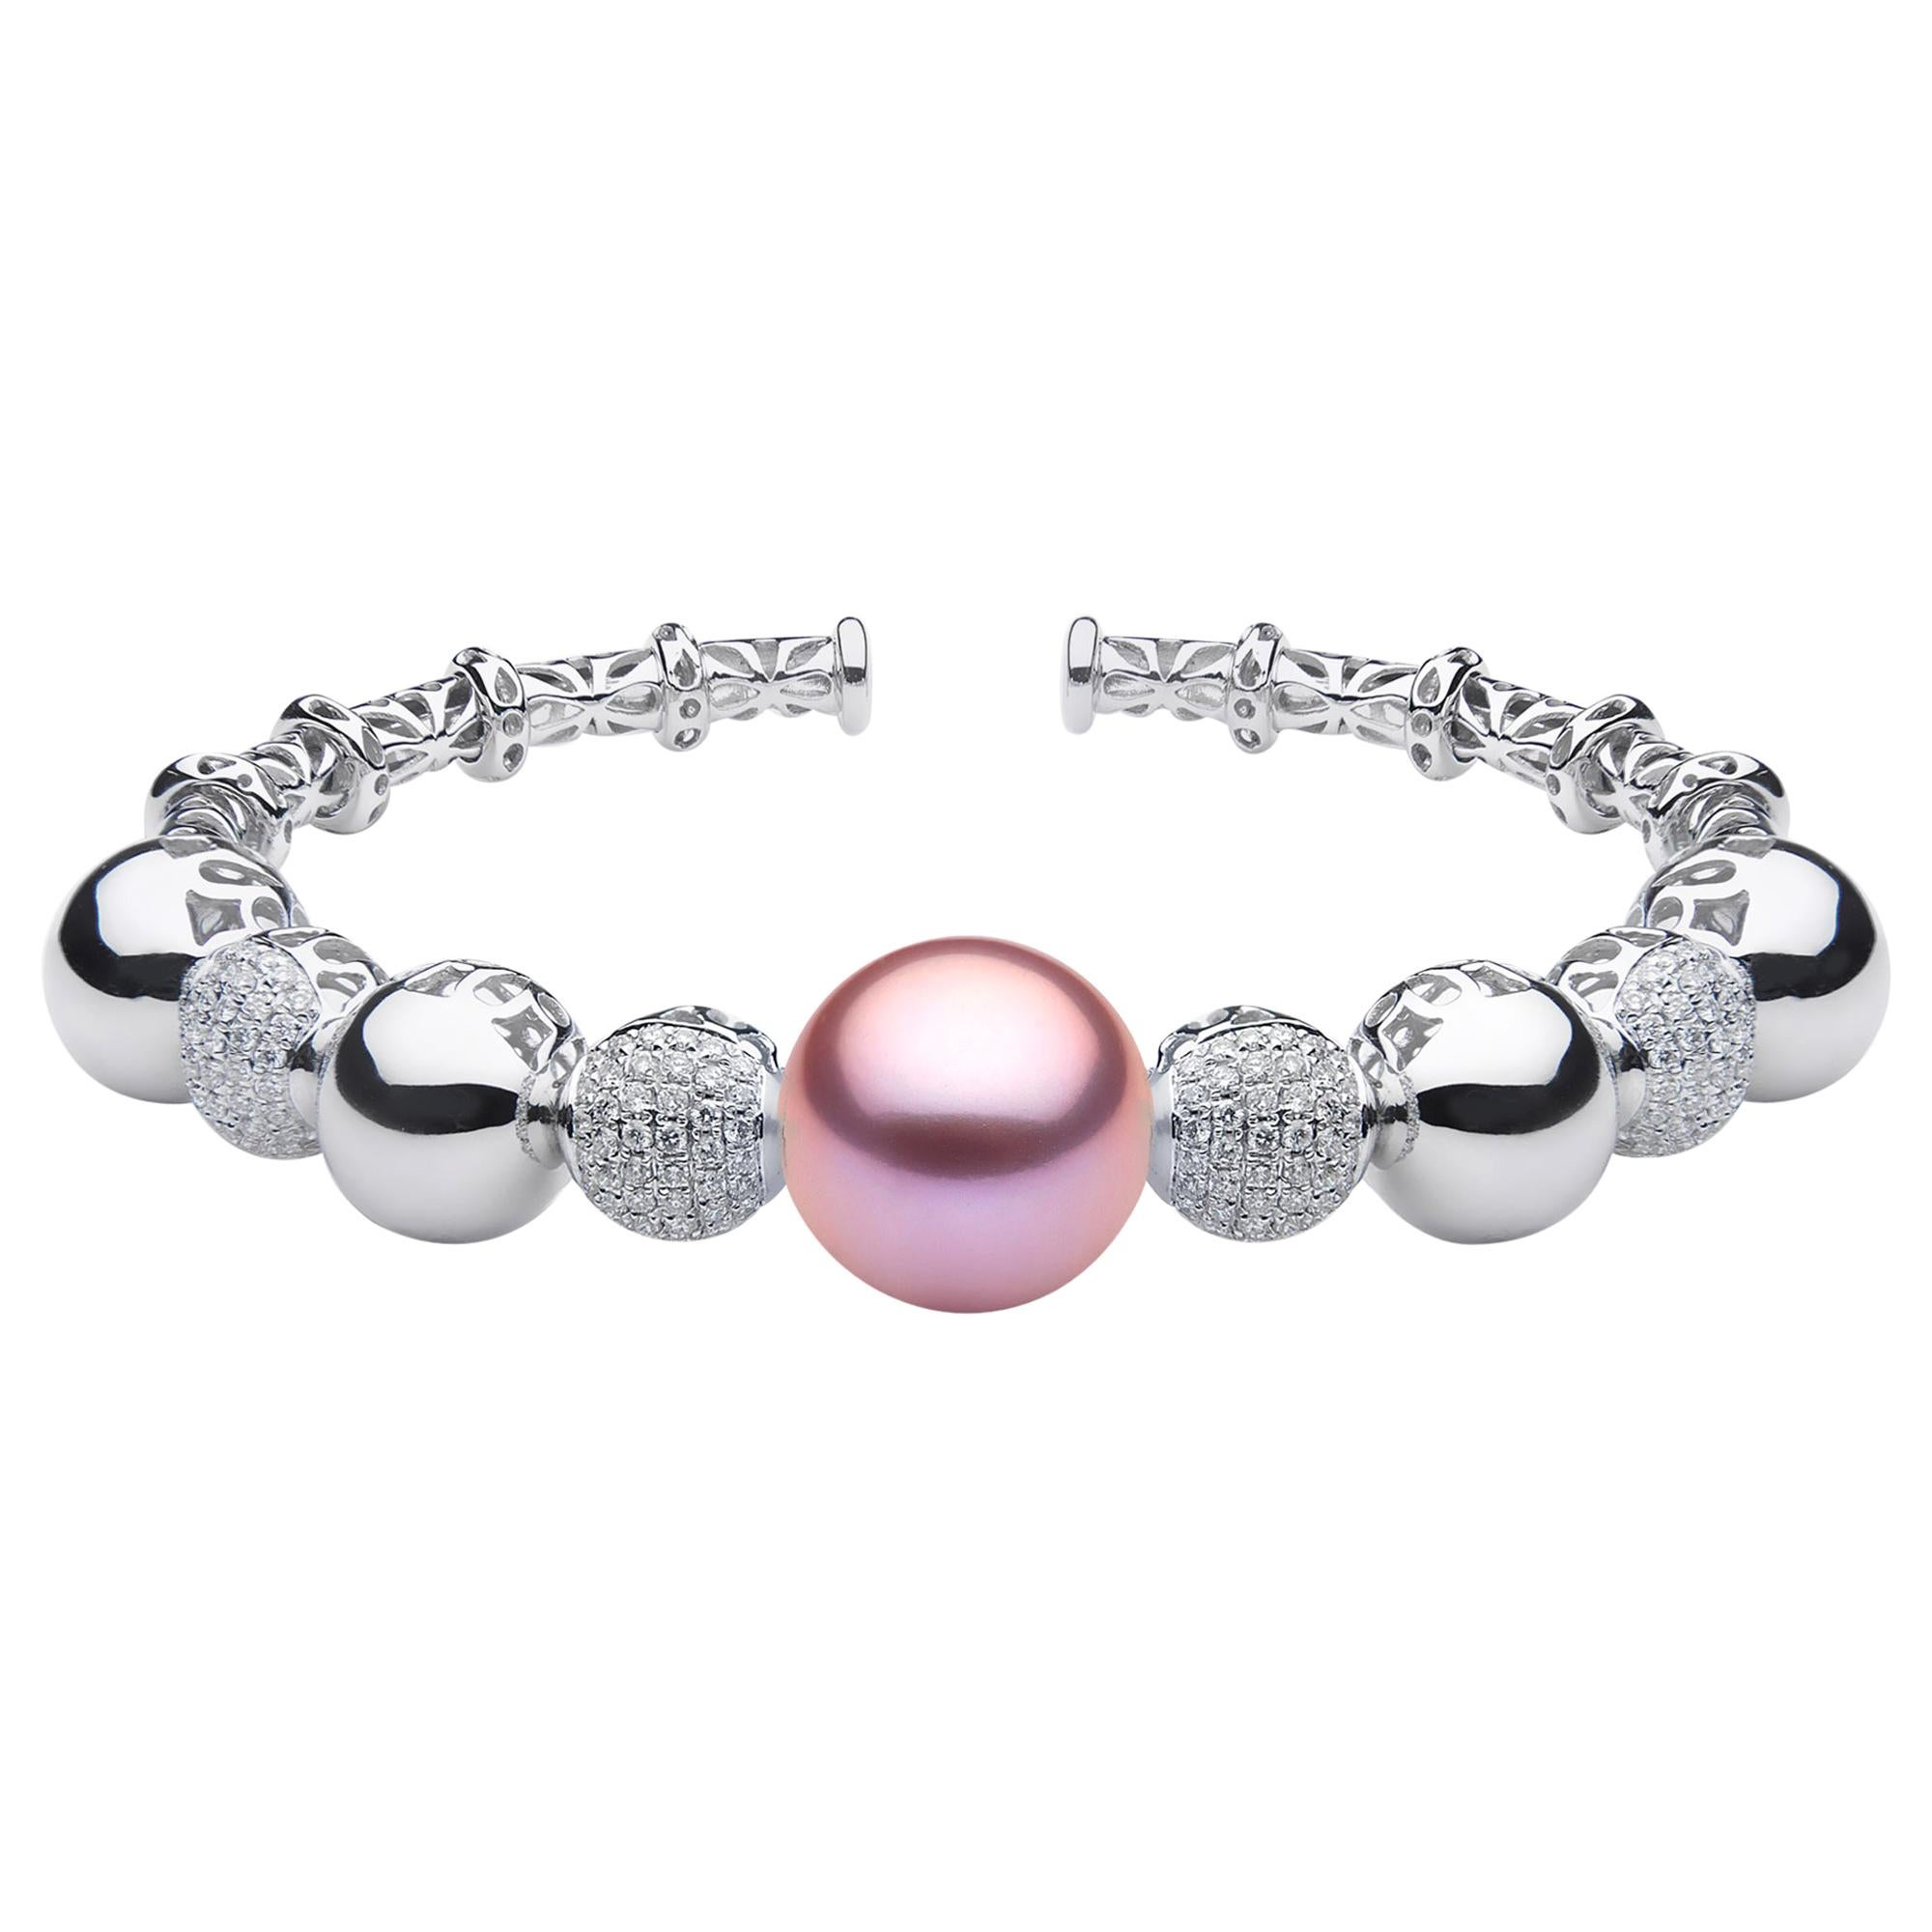 Yoko London Pink Pearl and Diamond Bangle in 18 Karat White Gold